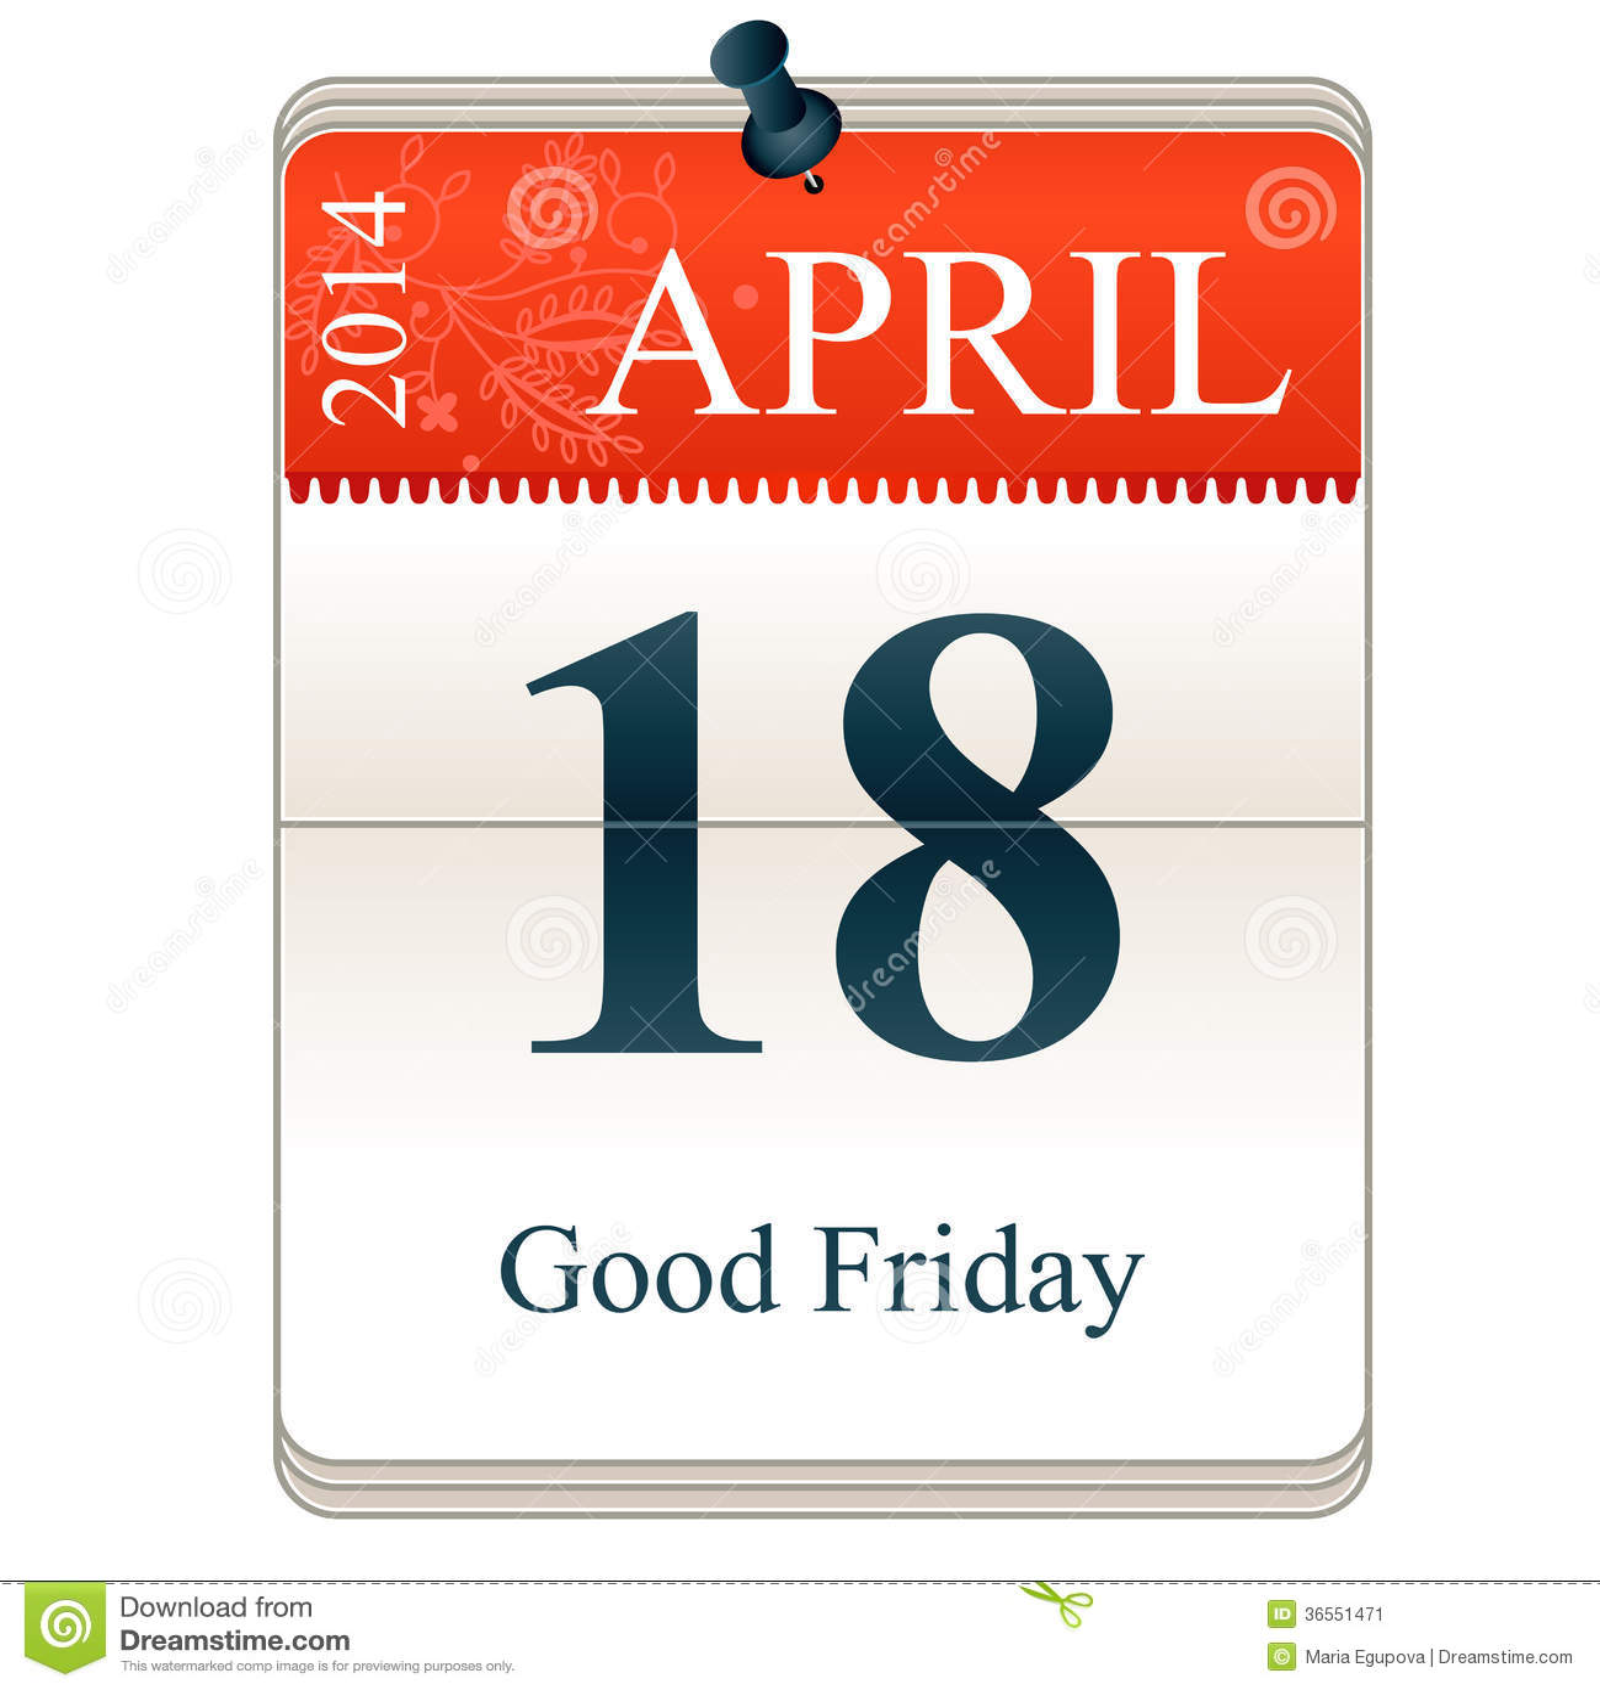 Calendar Good Friday : Good friday stock image